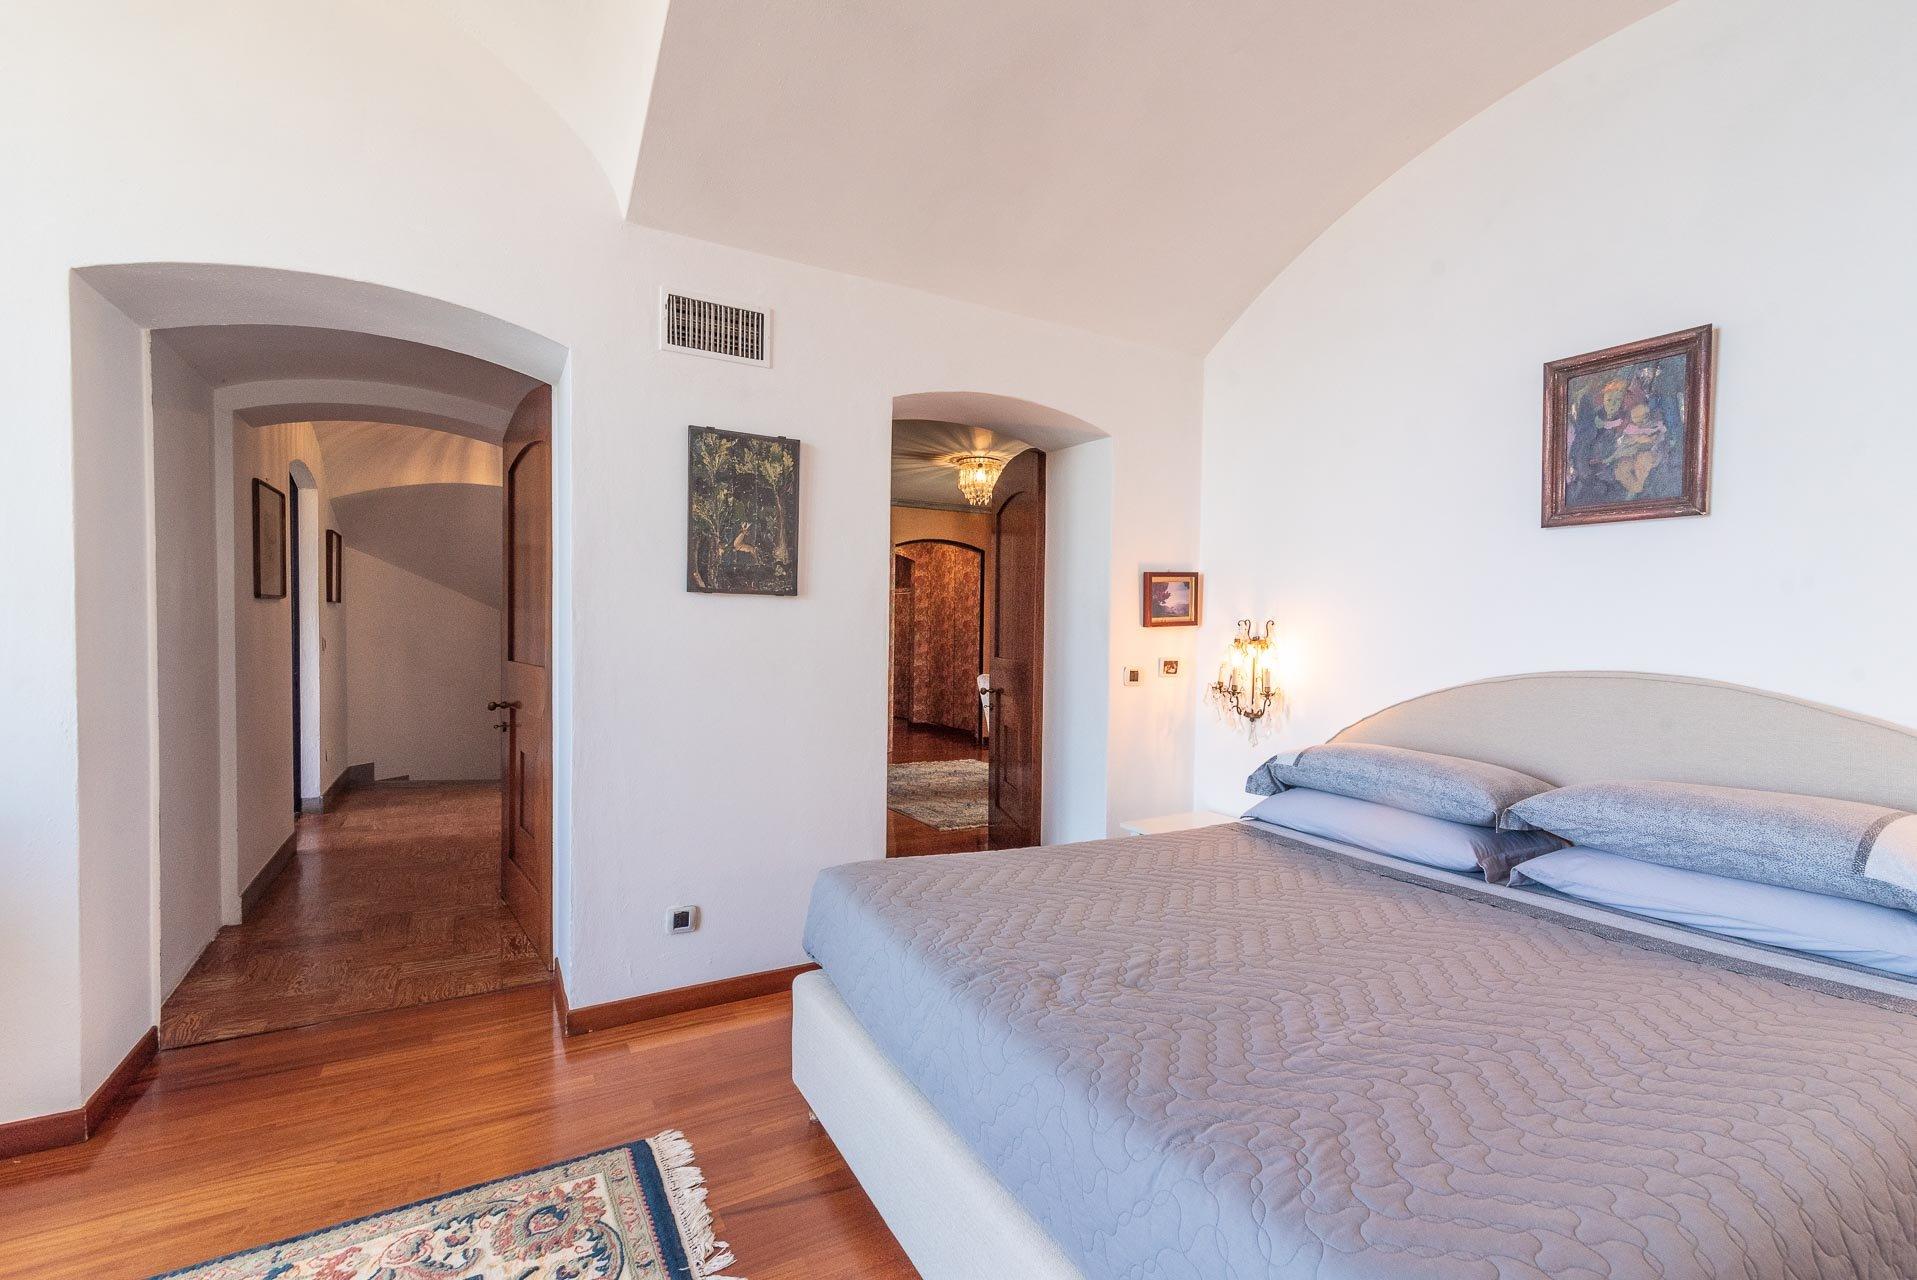 Elegant lake view villa for sale in Stresa - guest room